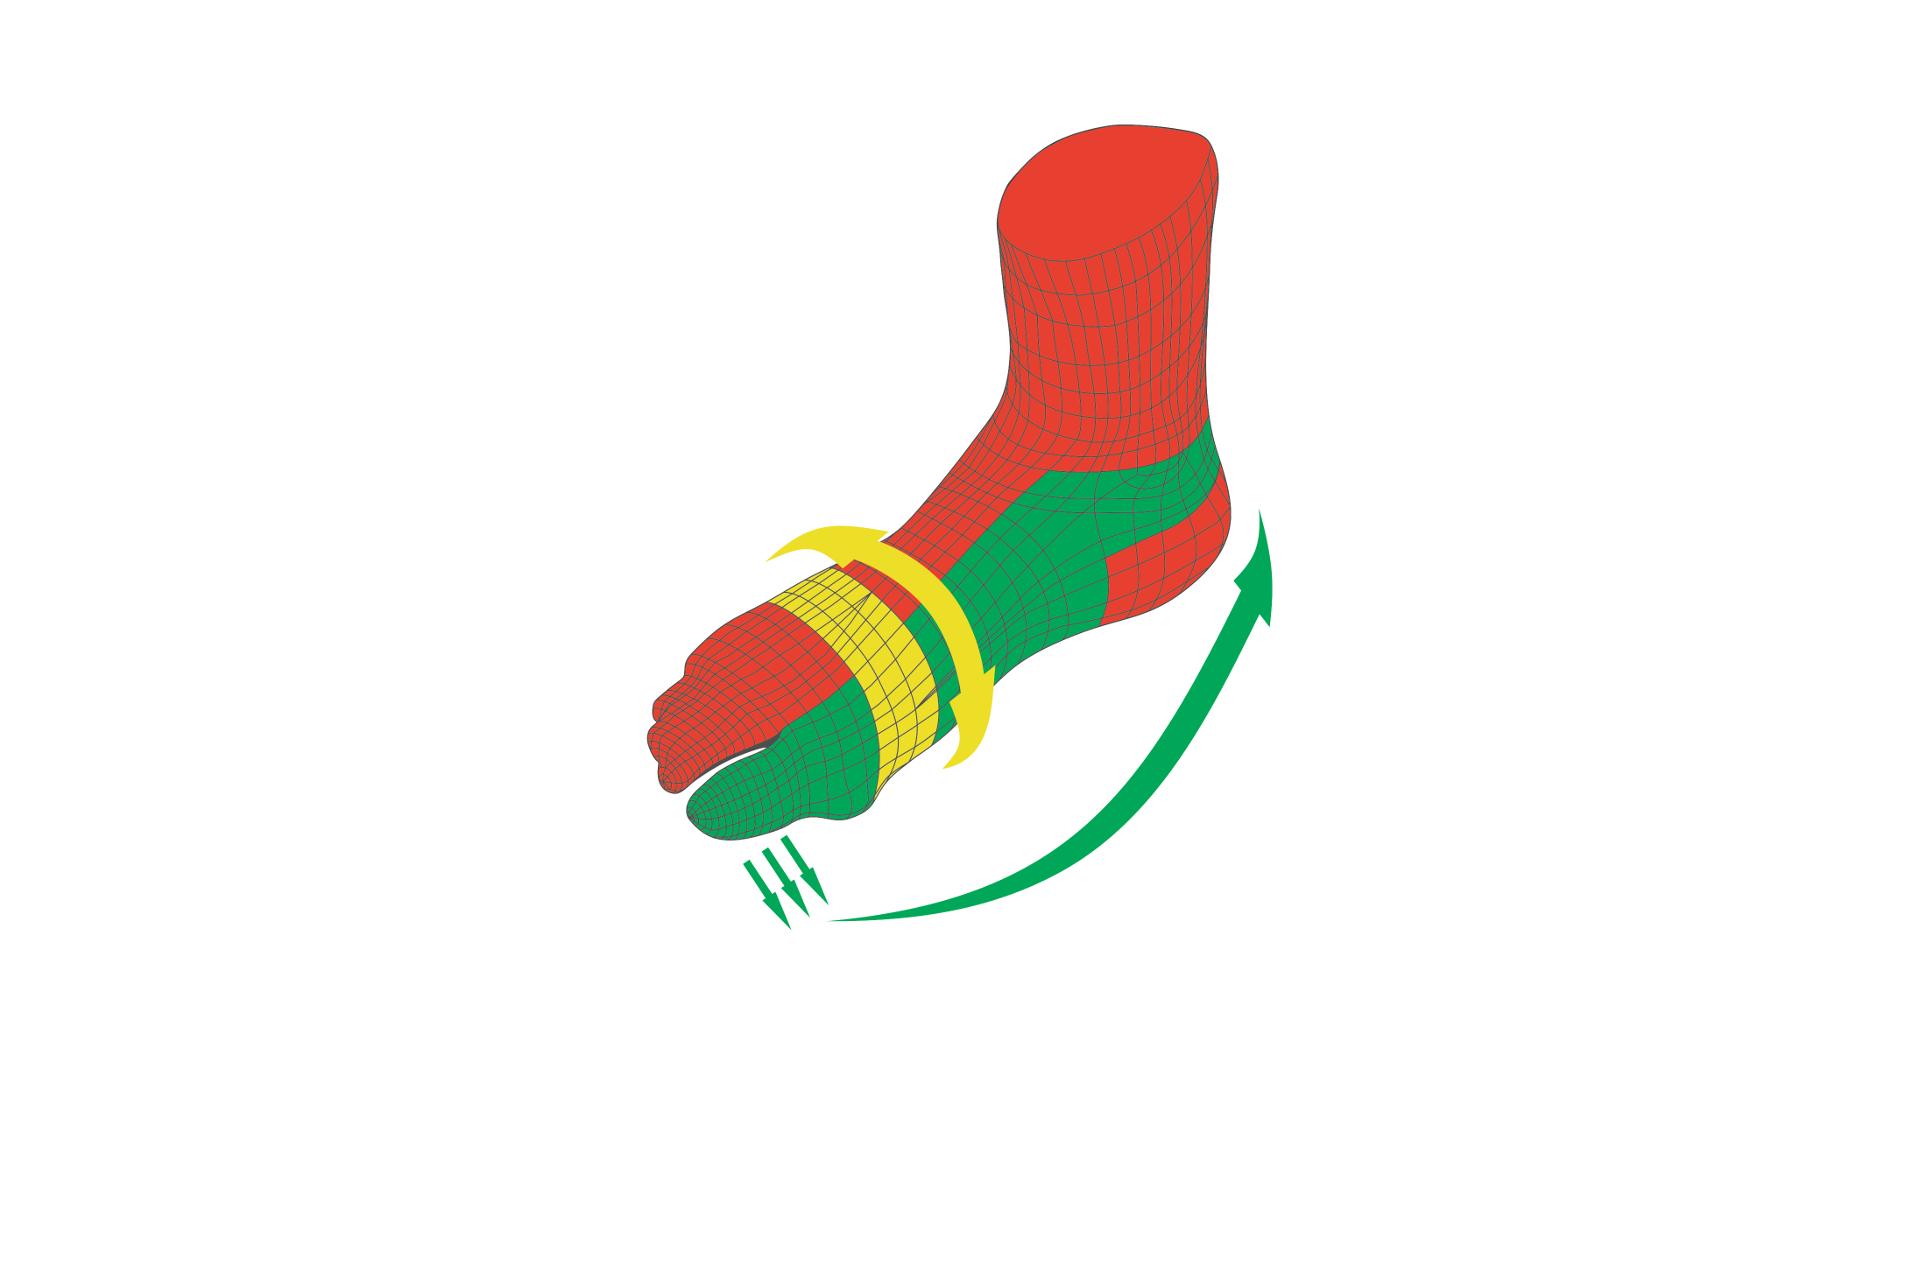 slider-arthrolux-disegno-3d